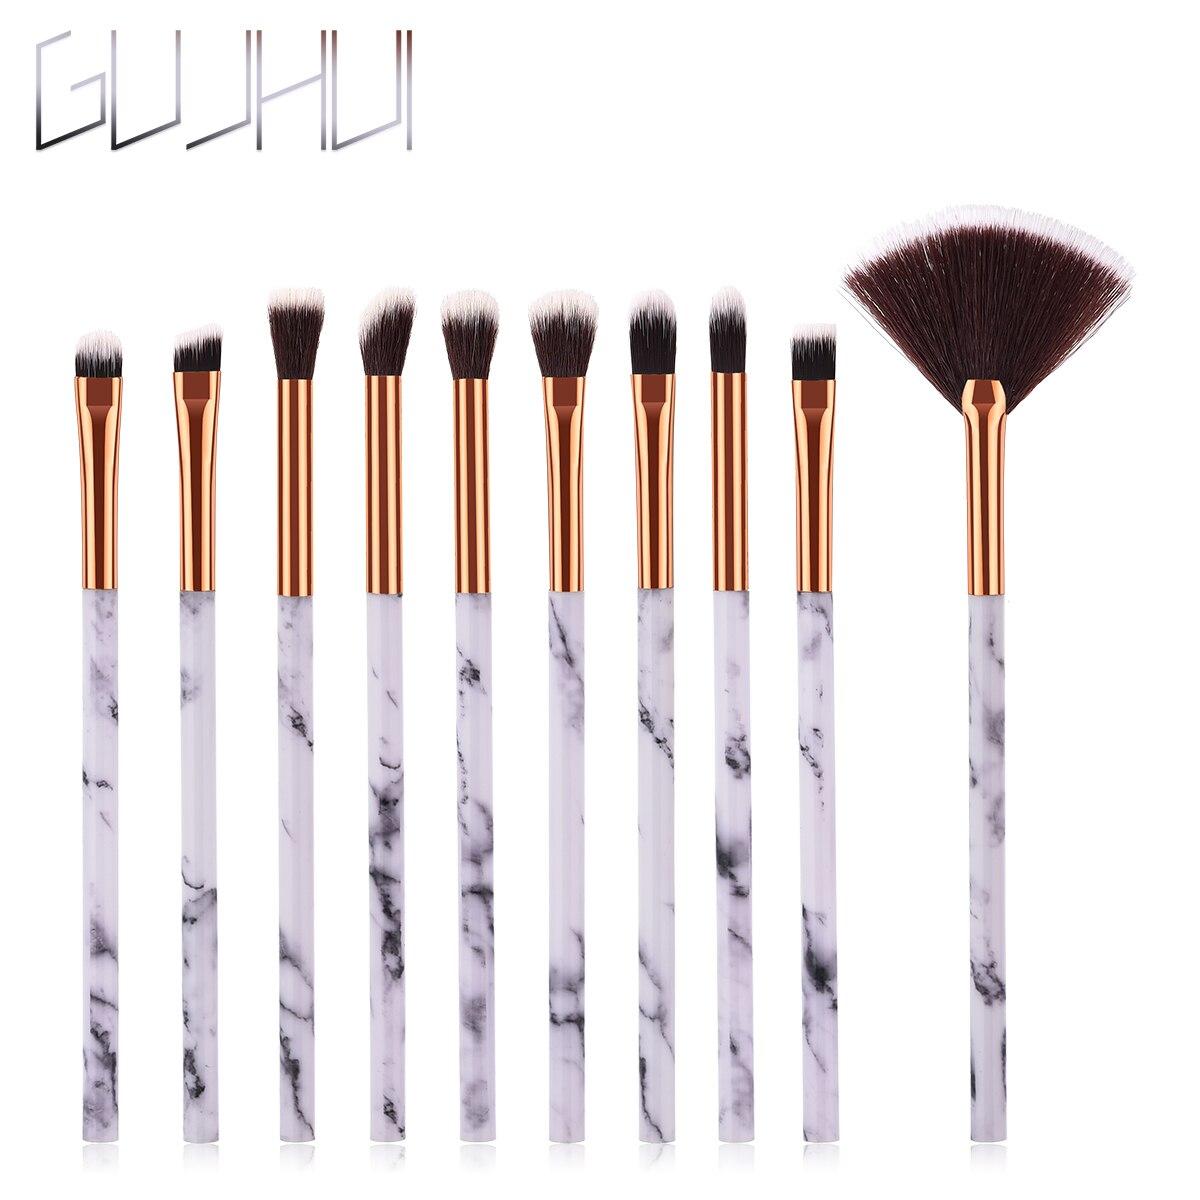 4 Pcs Set High Quality New Women Professional Makeup Brush Tools Travelling  5pcs Soft Nylon Hair 6pcs Brushes Powder Eye Shadow Eyebrow Lip Concealer Fan Beauty Cosmetic